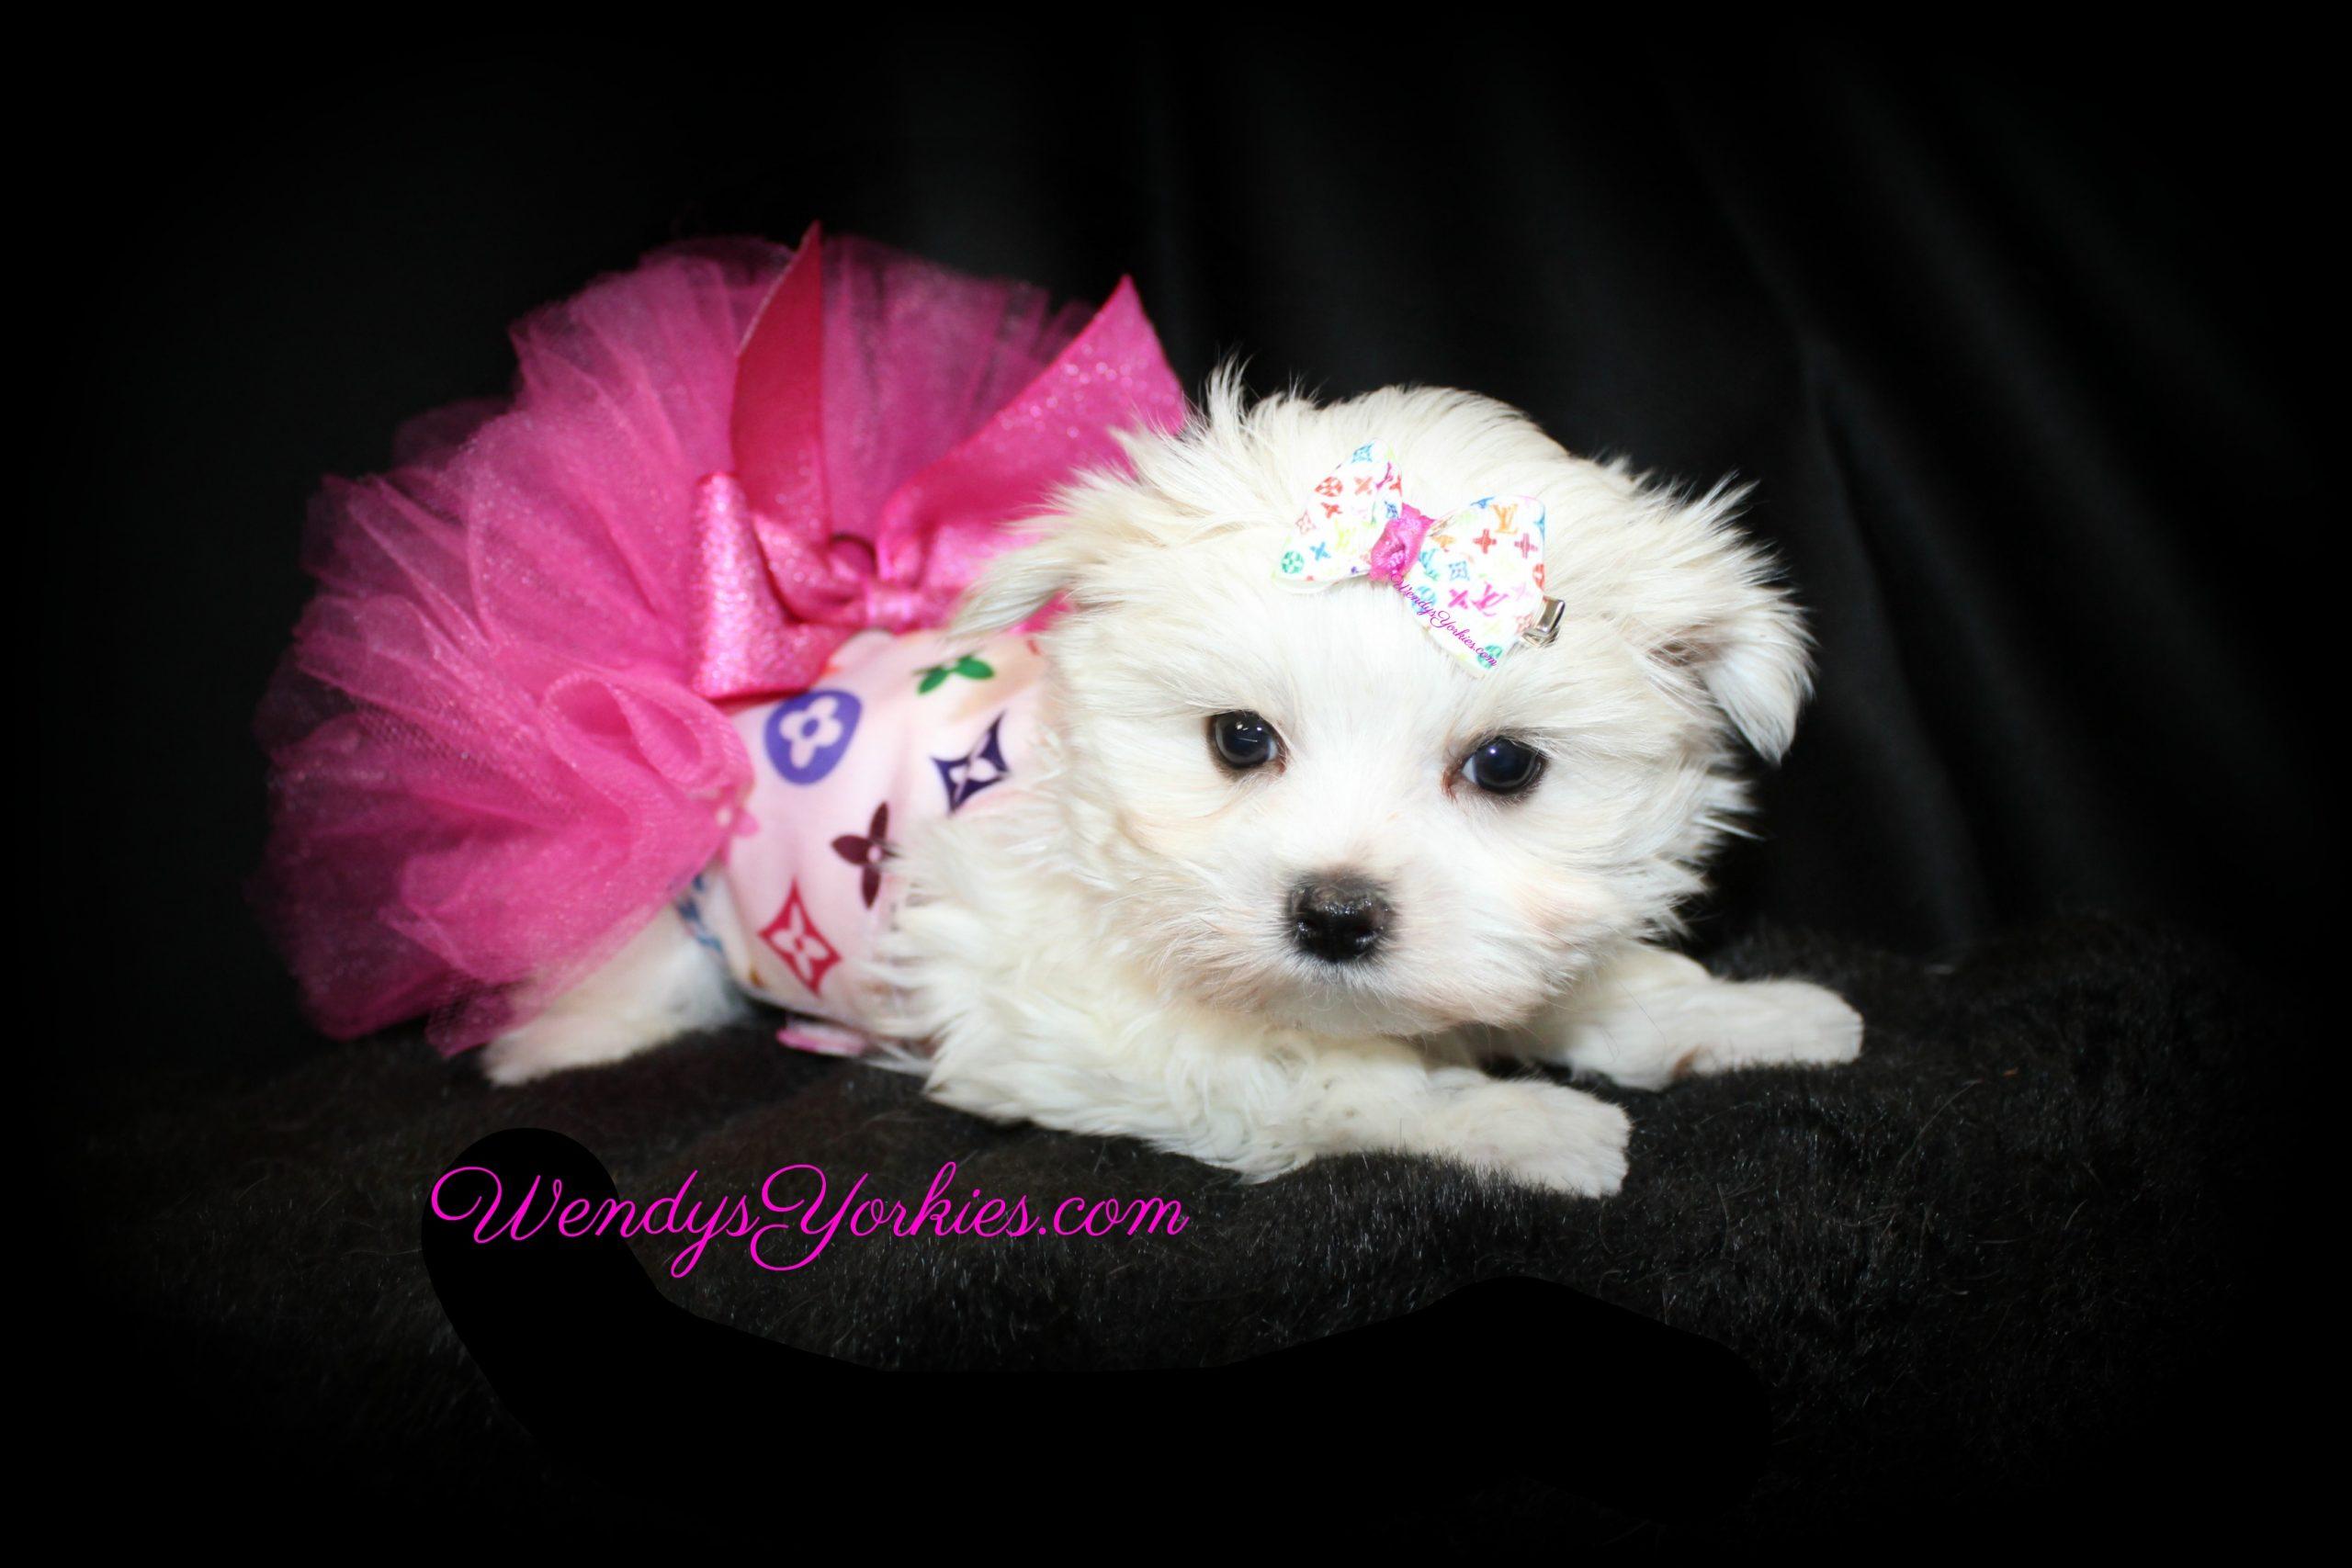 Toy Maltese puppy for sale in Texas, Ellie, WendysYorkies.com